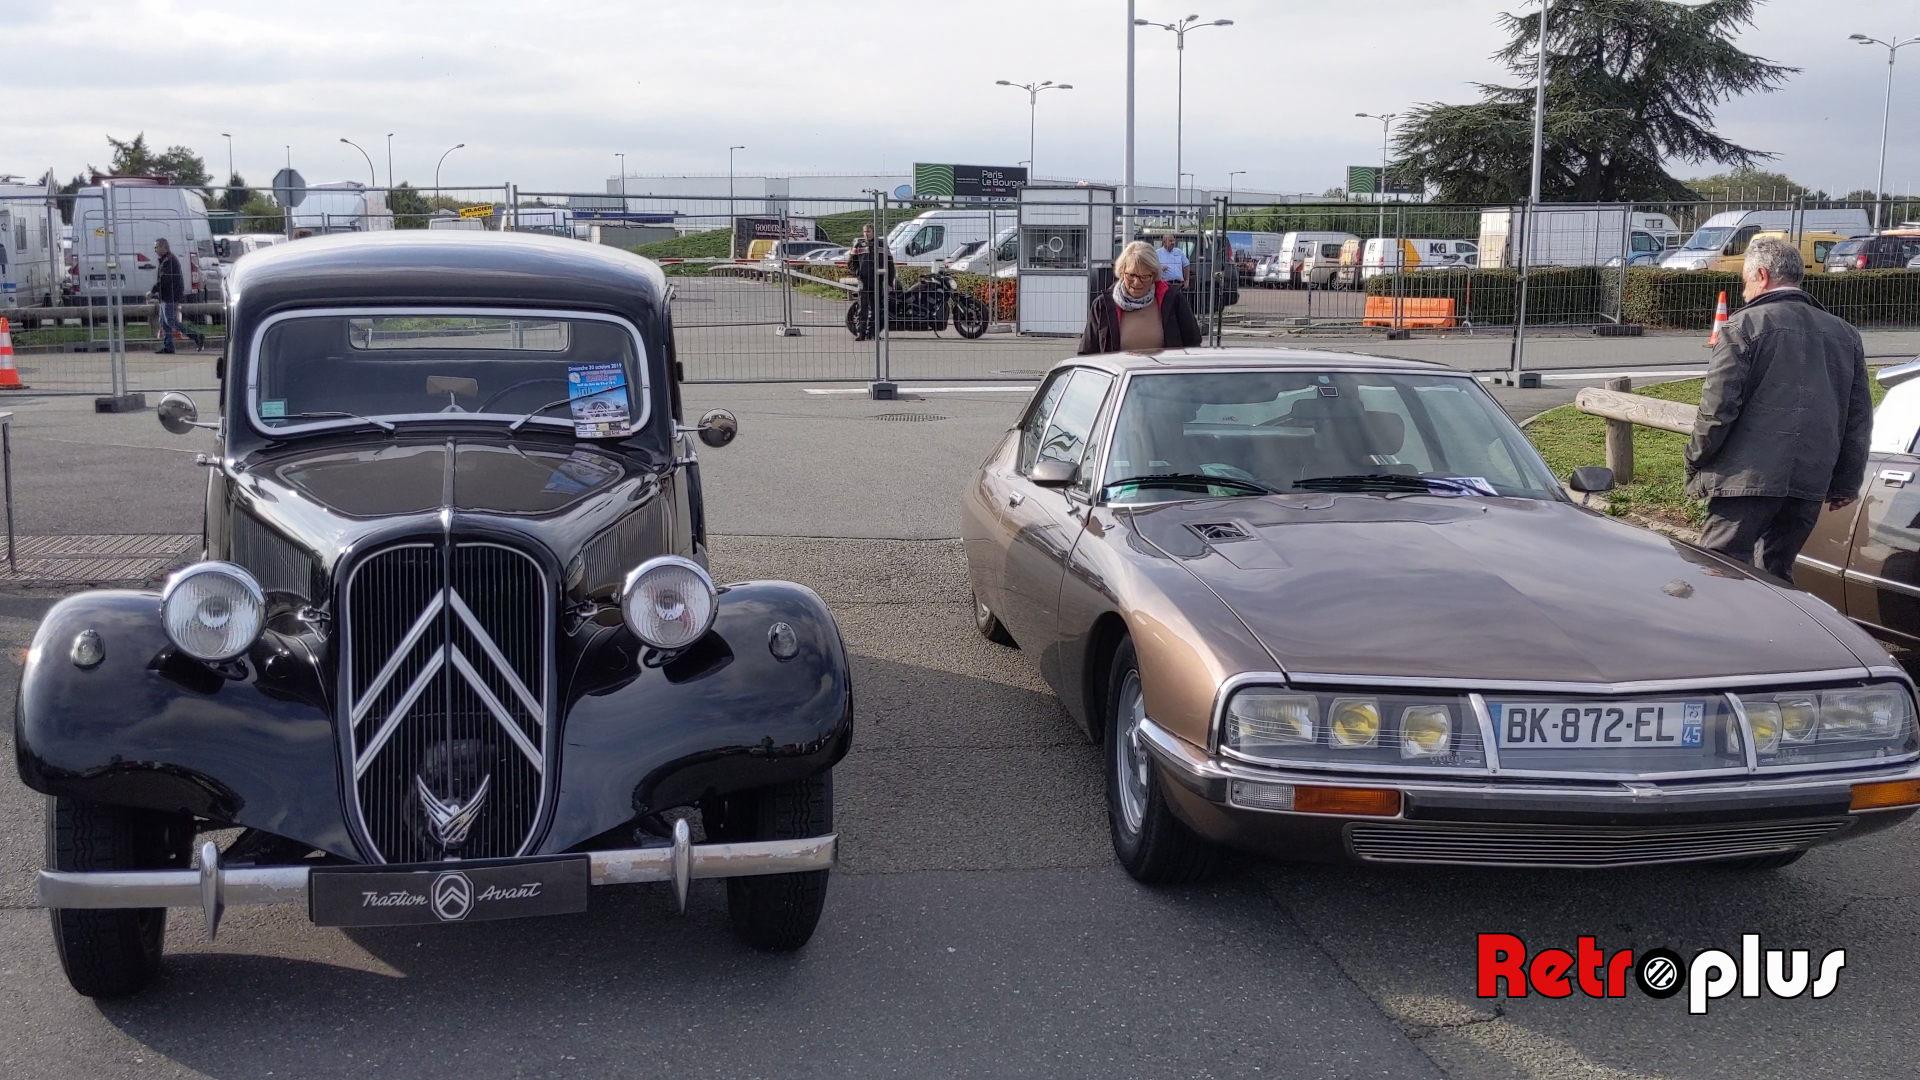 Automedon2019-parkingCitroen6